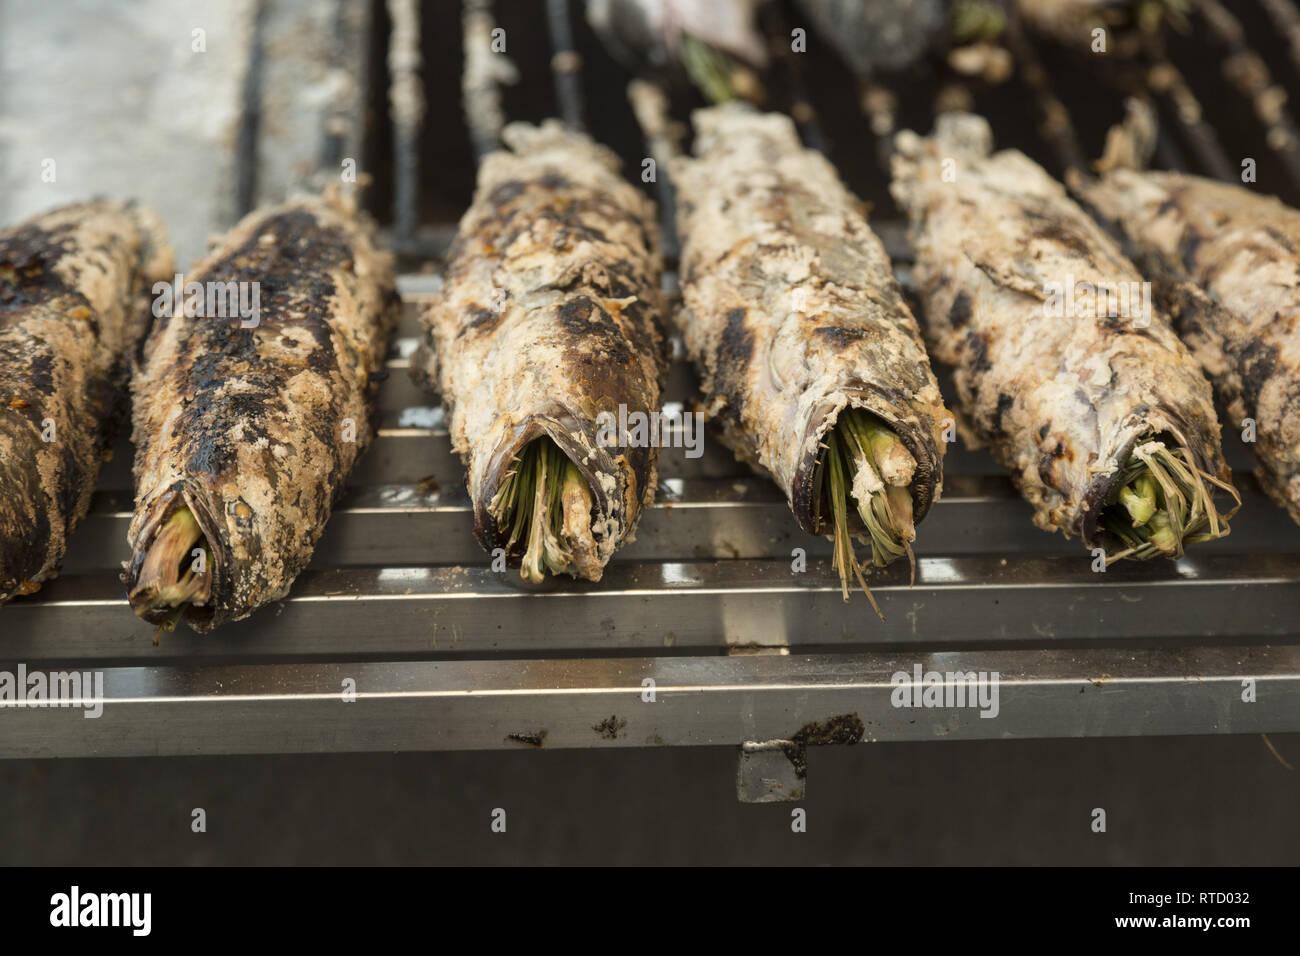 Poissons frits farcis Photo Stock